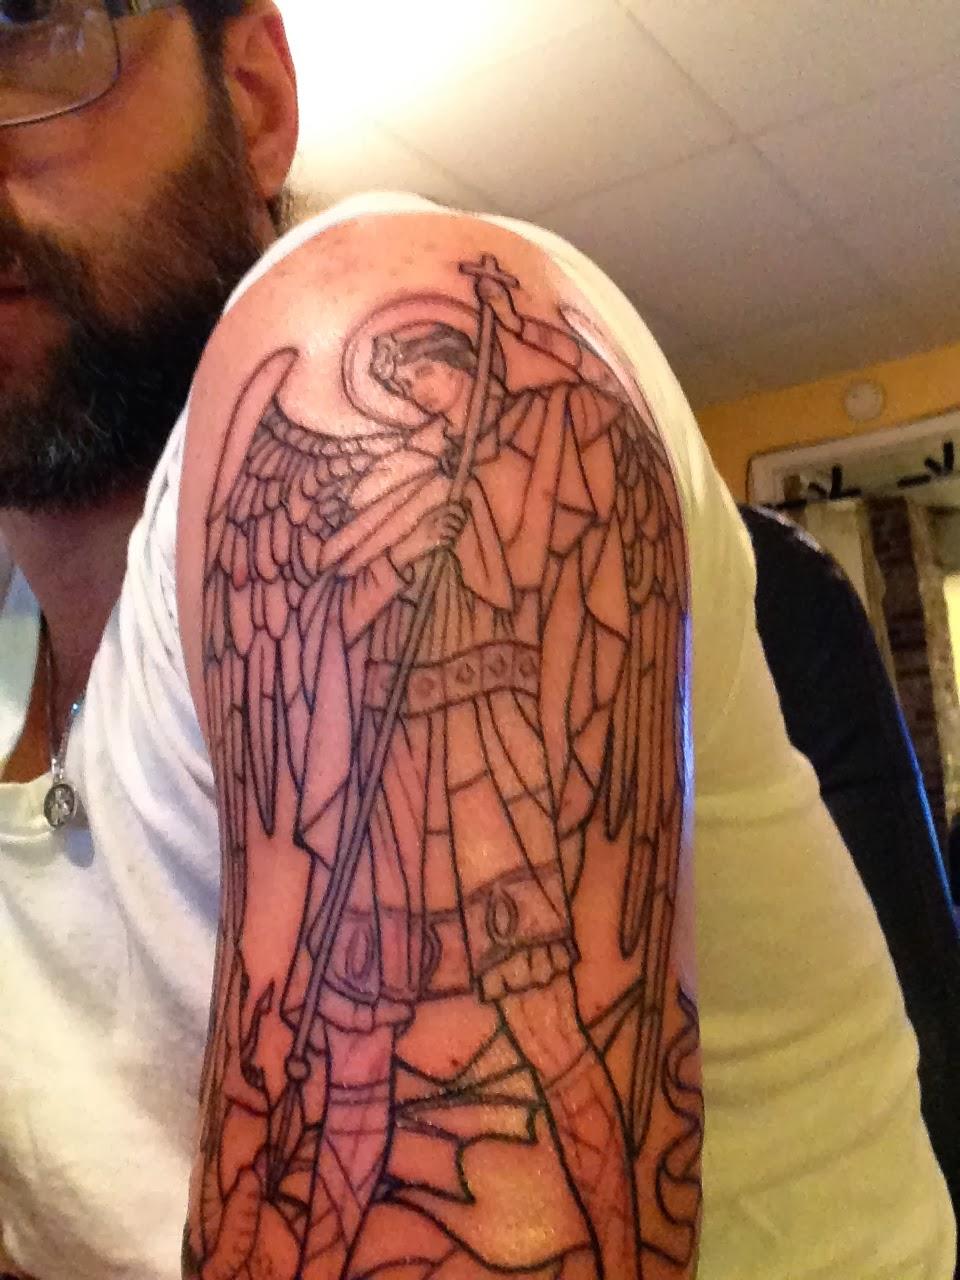 pin archangel michael defeating lucifer tattoo design saint raphael angel on pinterest. Black Bedroom Furniture Sets. Home Design Ideas